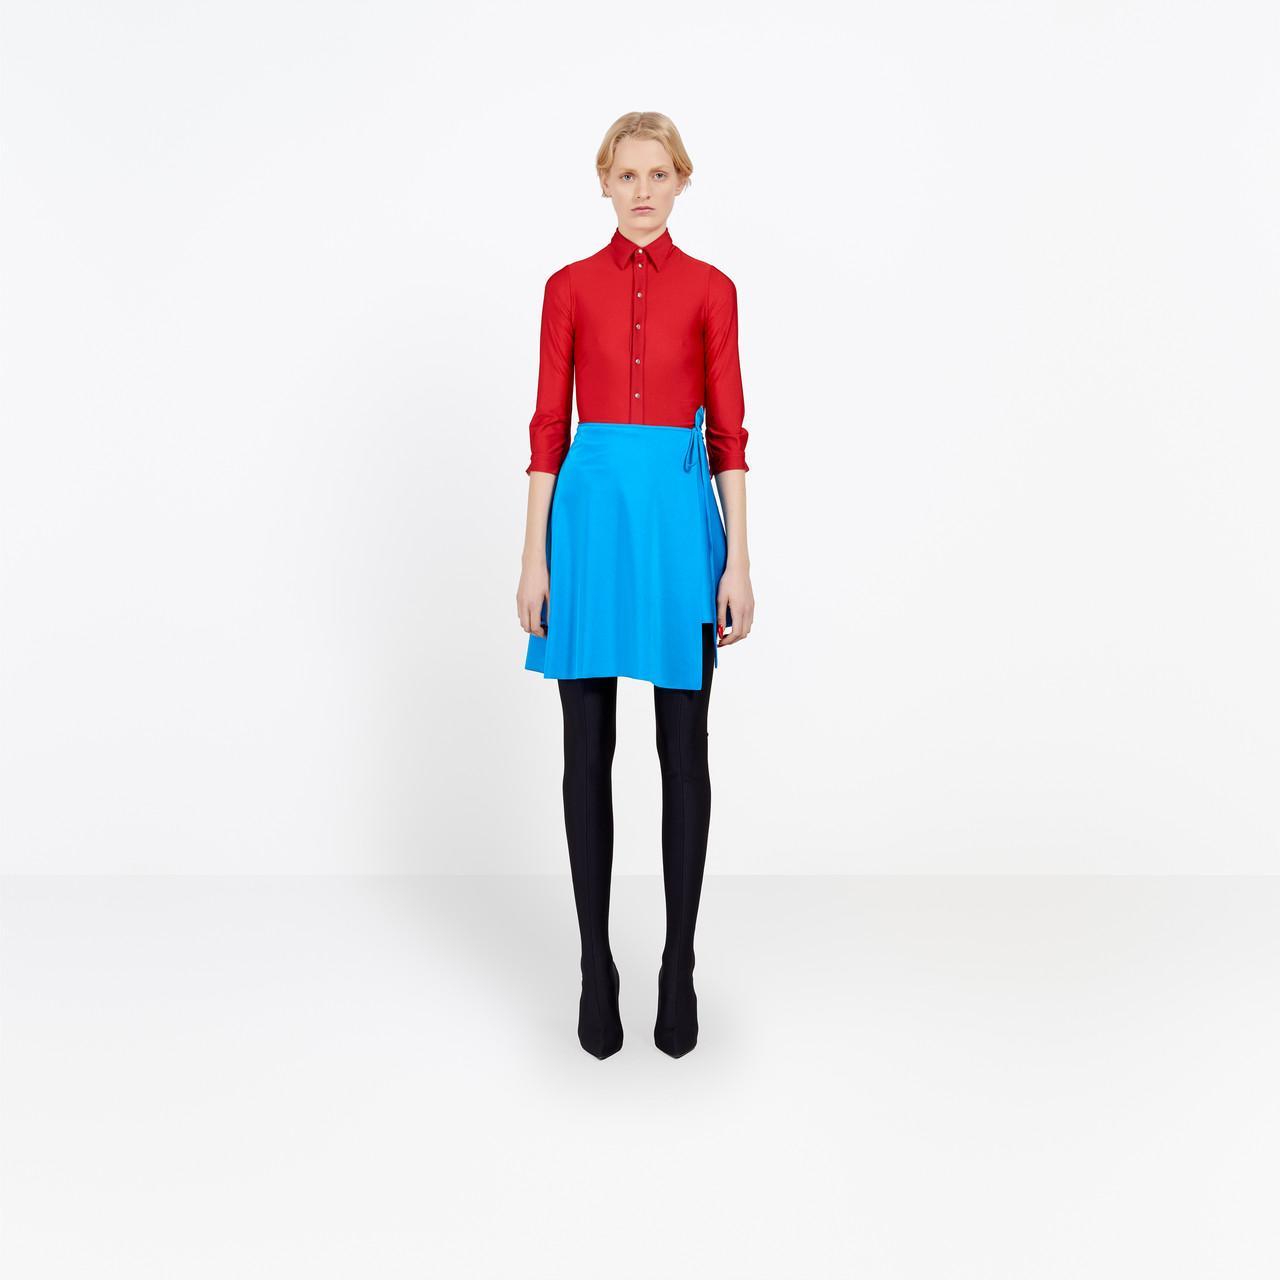 Lyst Balenciaga Shrunk Shirt In Red